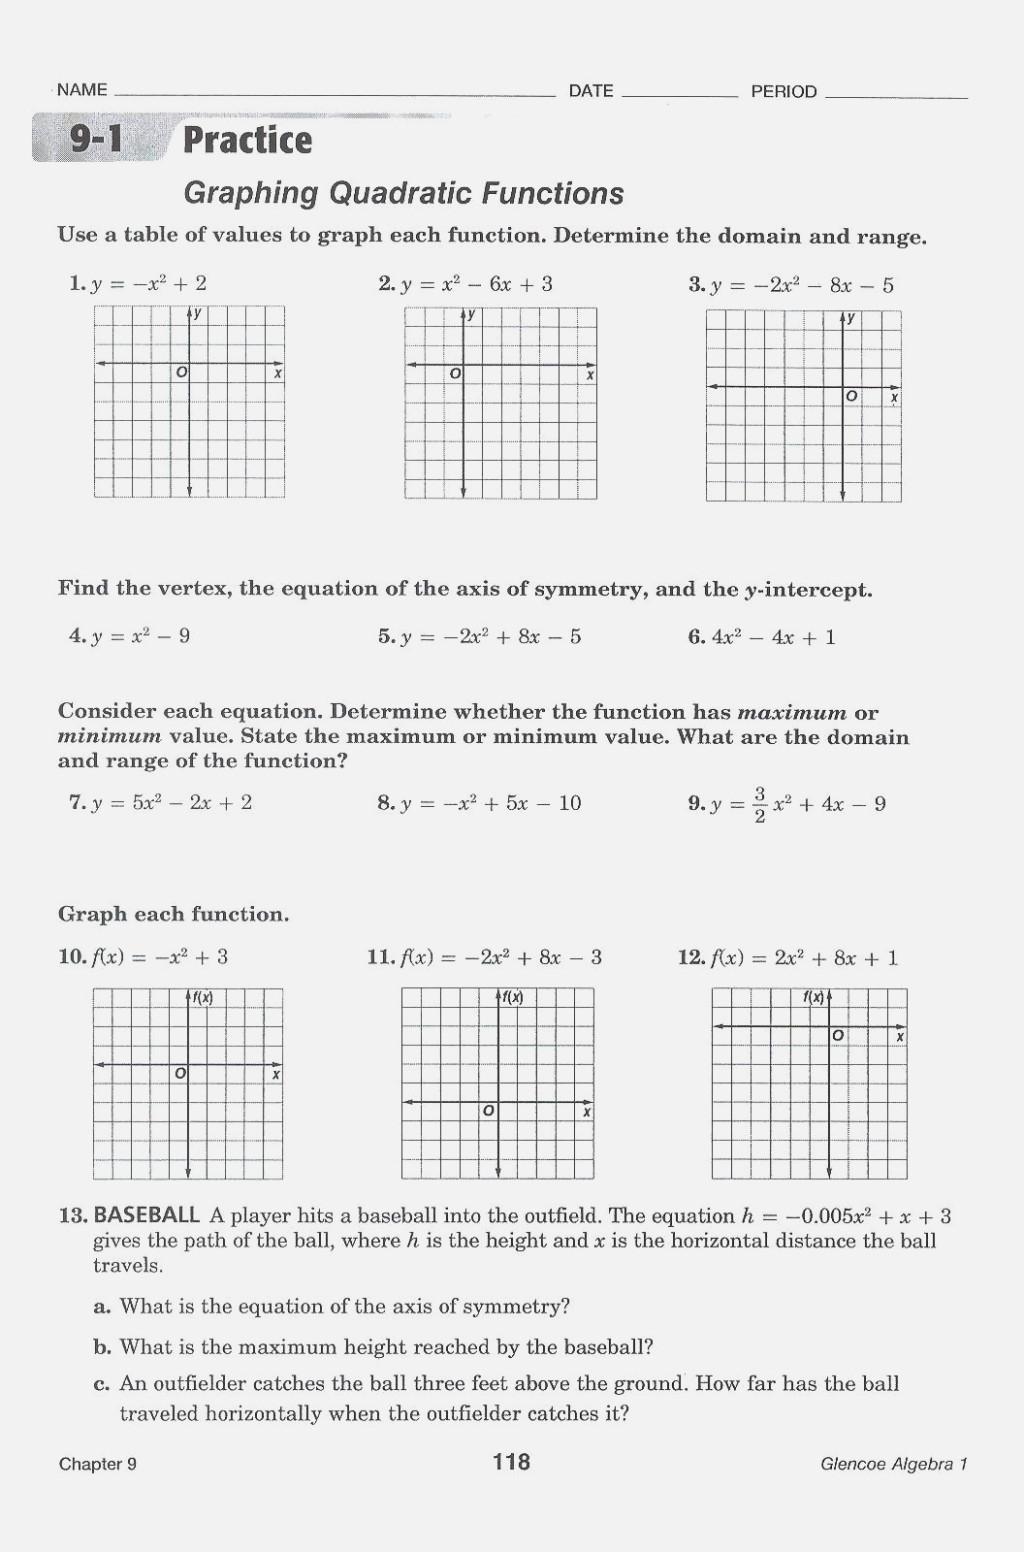 Graphing Quadratic Functions Worksheet Worksheet Graphing Quadratic Functions Keyfeatures